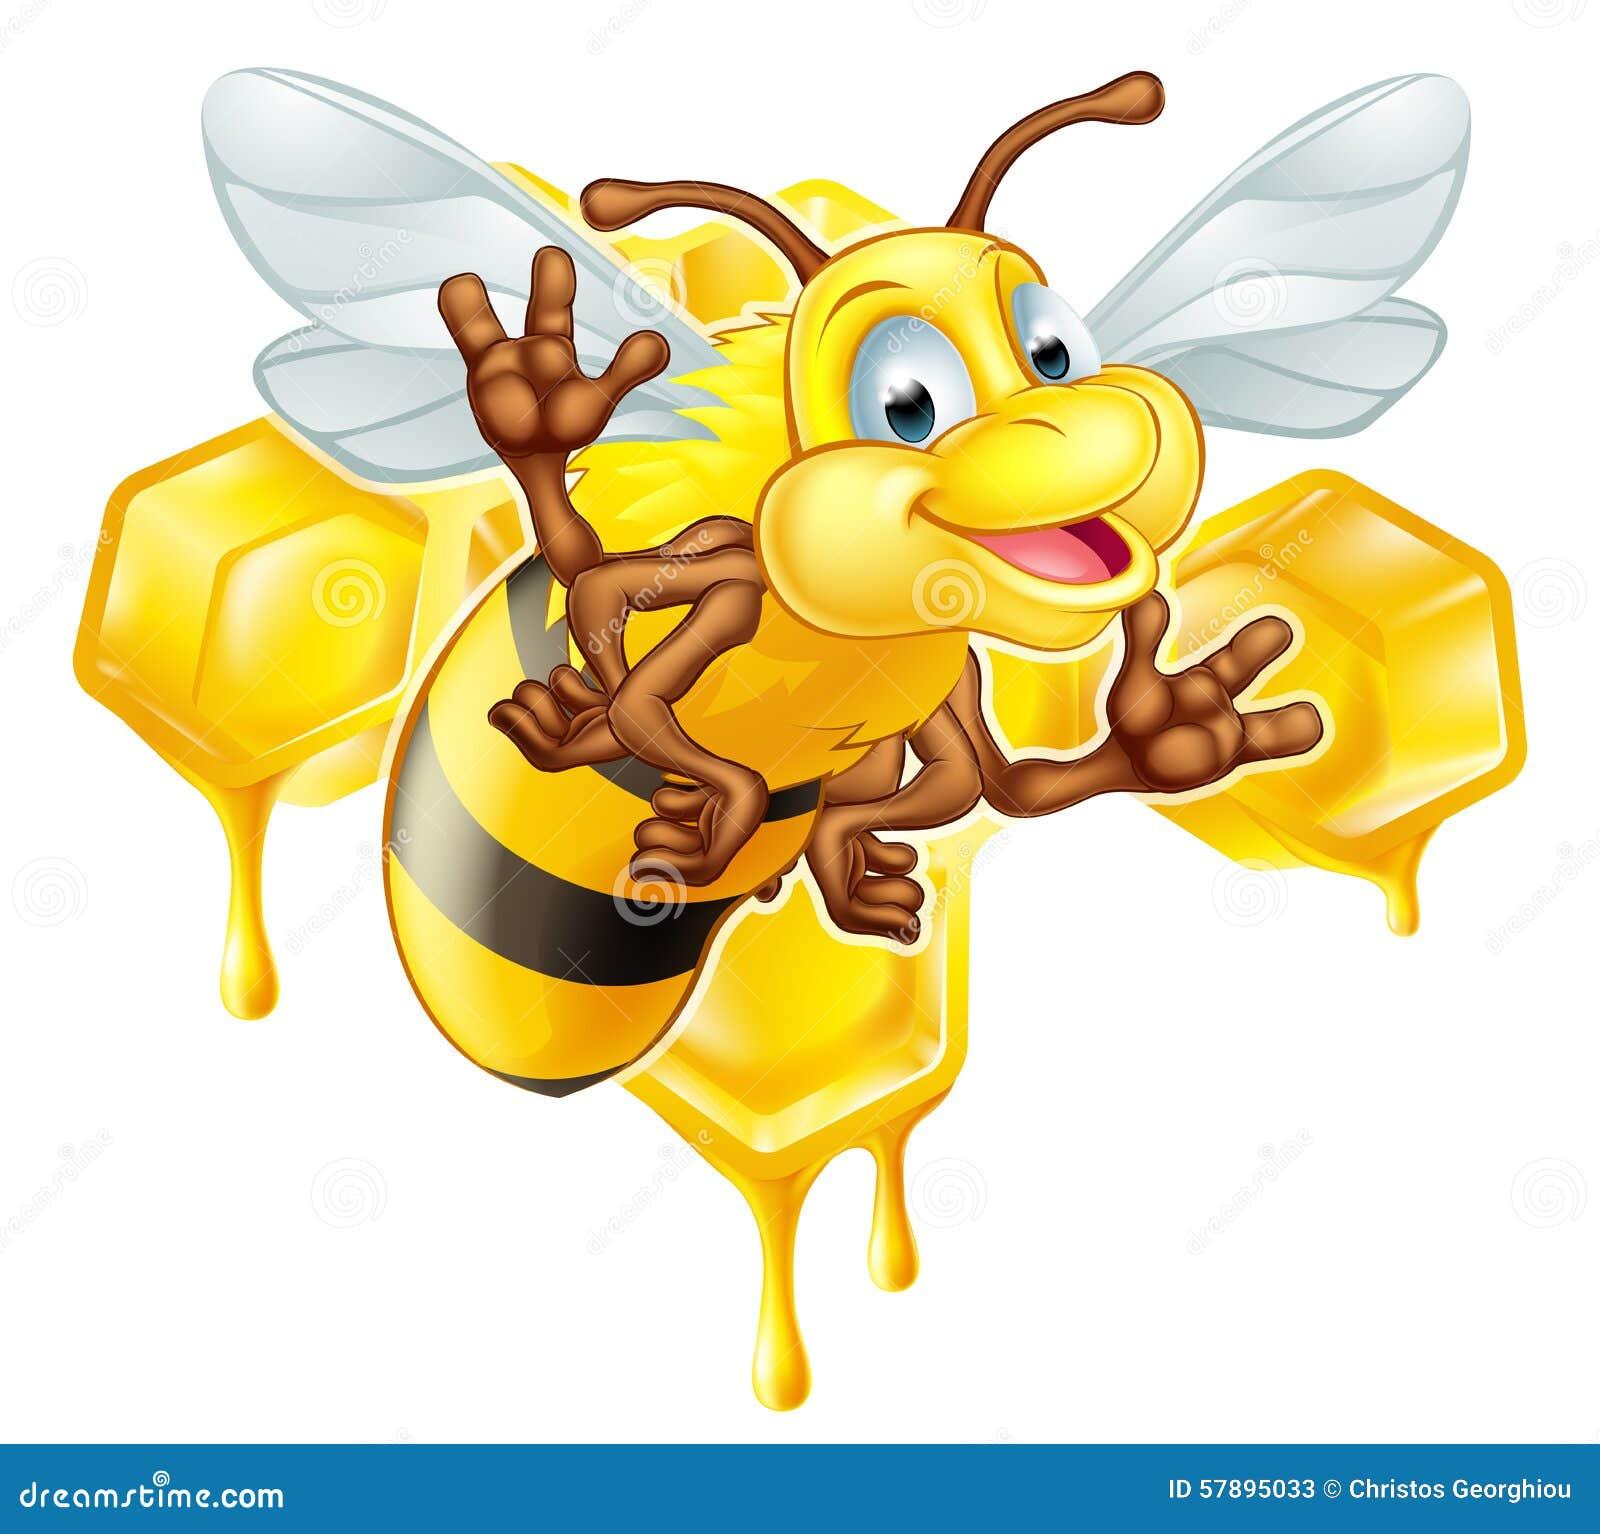 Cartoon Cute Bee And Honey Stock Vector